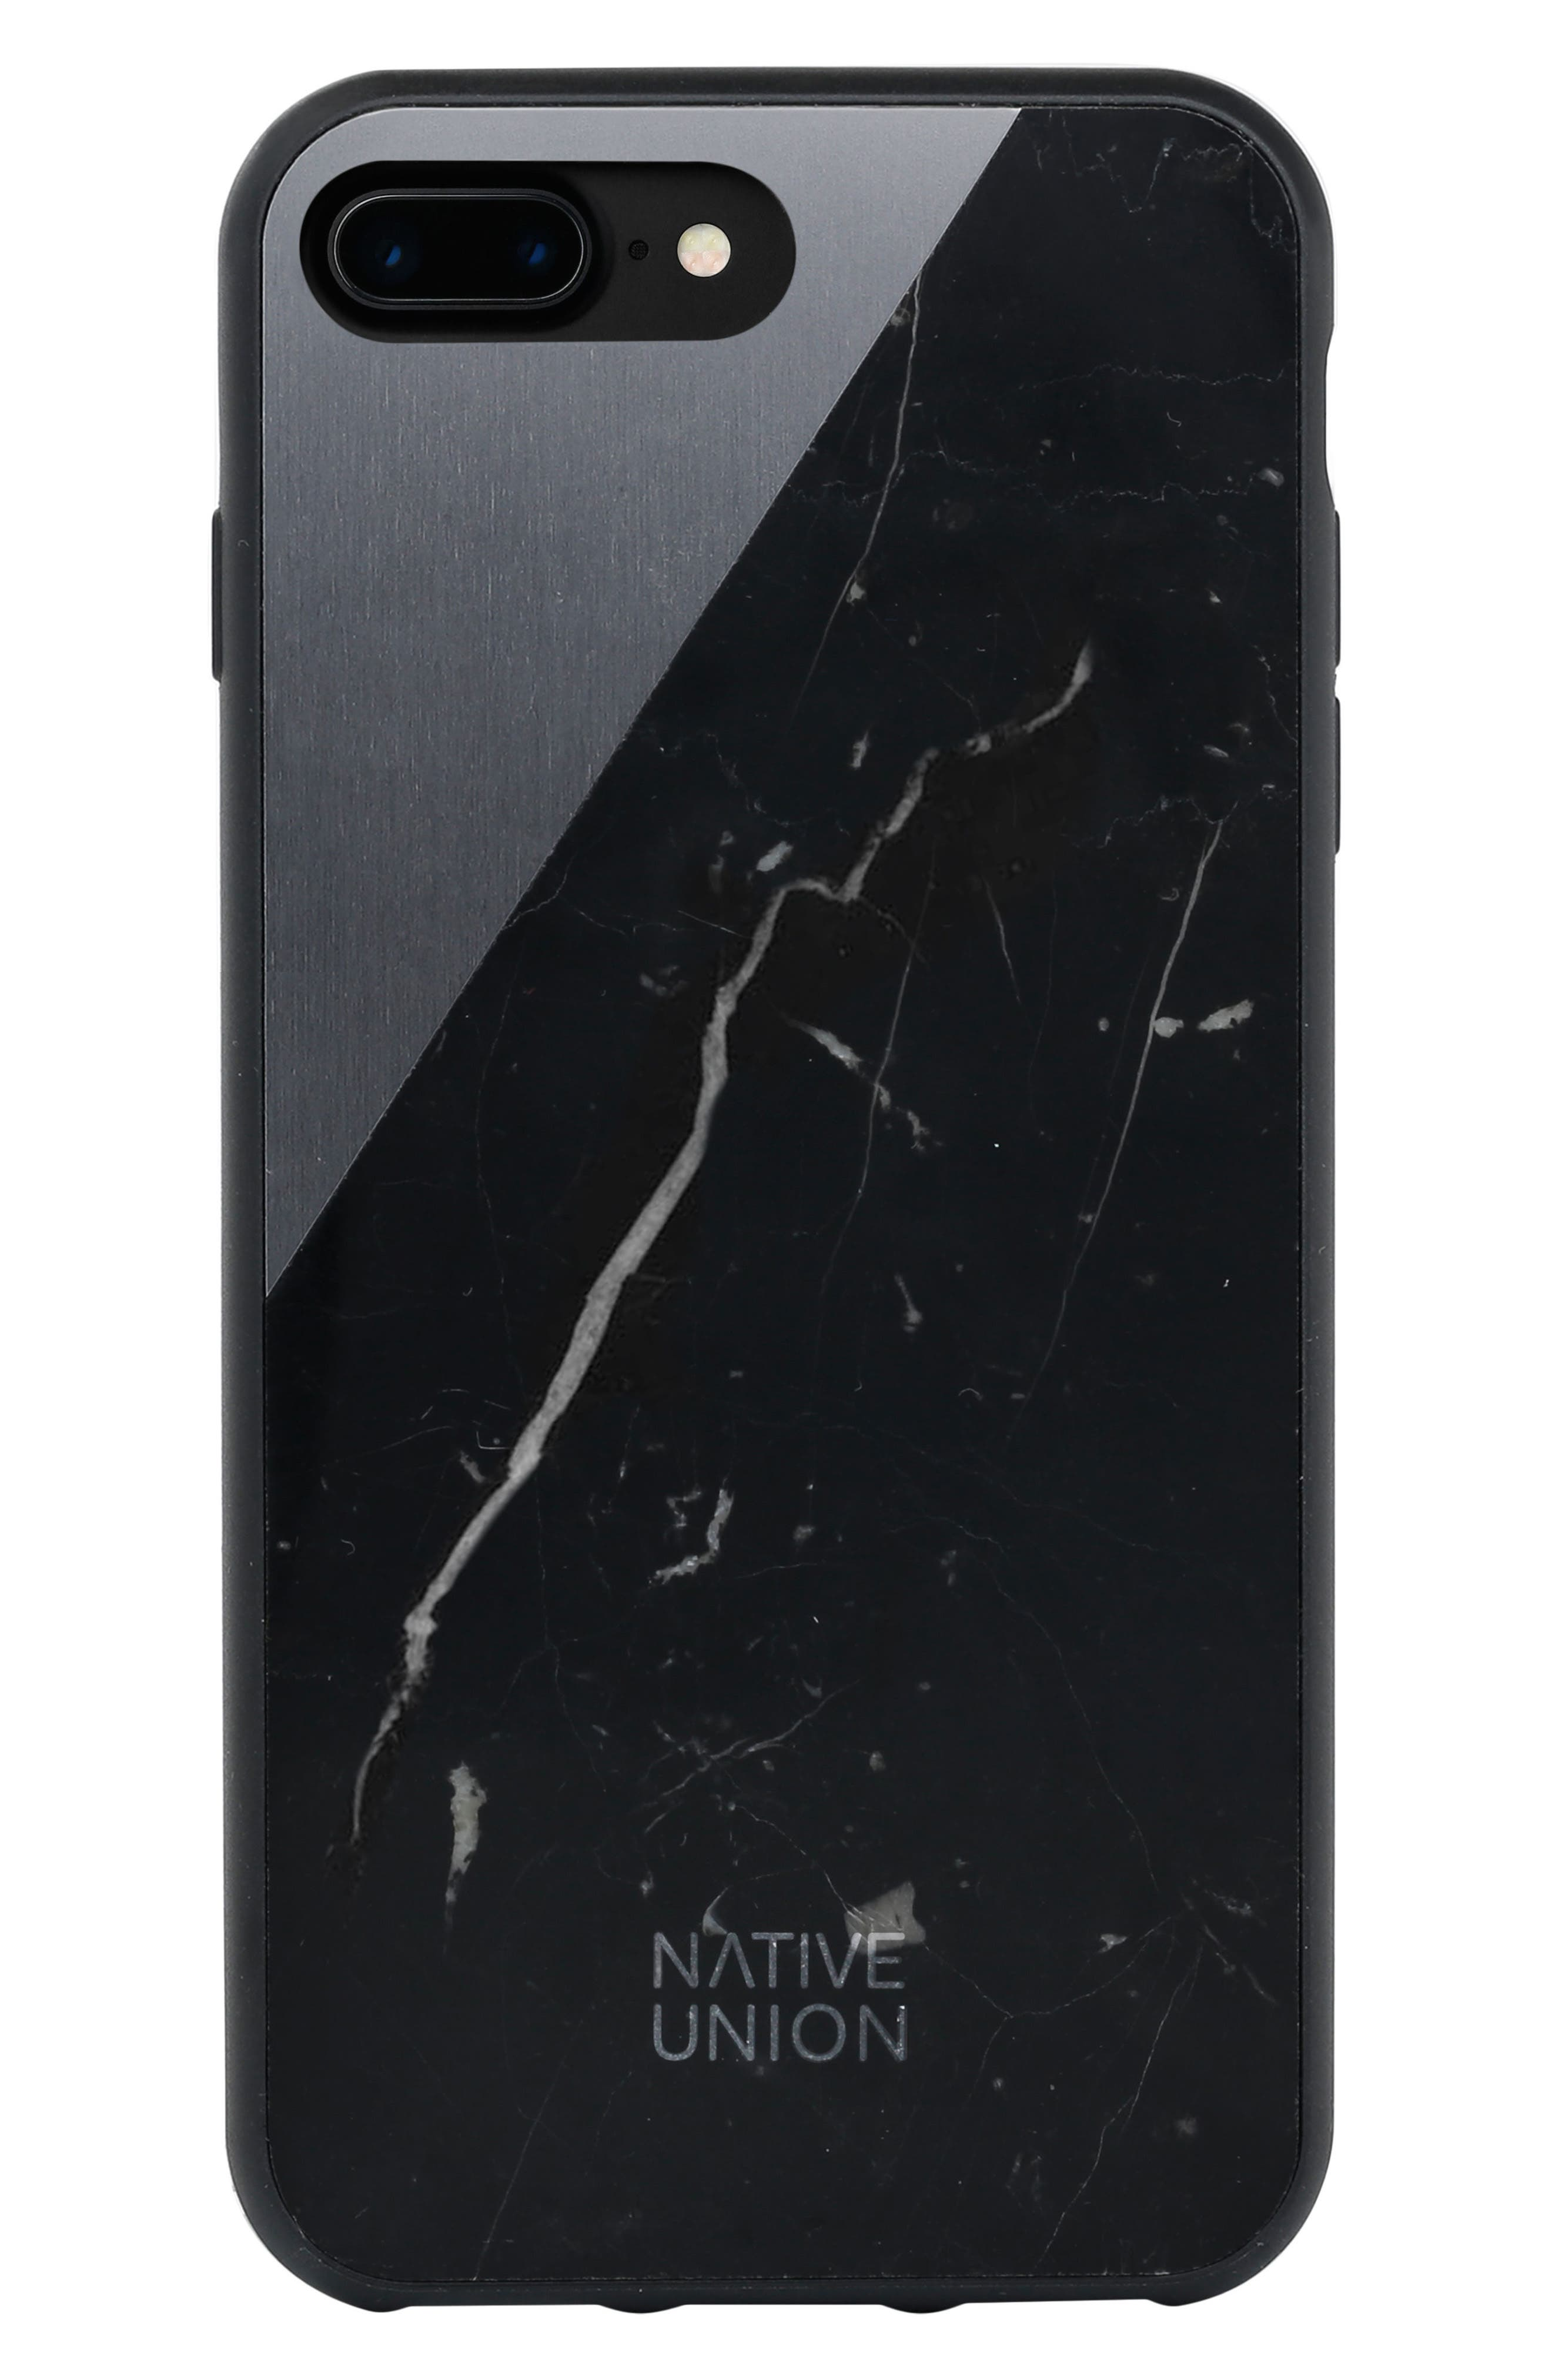 Main Image - Native Union CLIC Marble iPhone 7 & 7 Plus Case